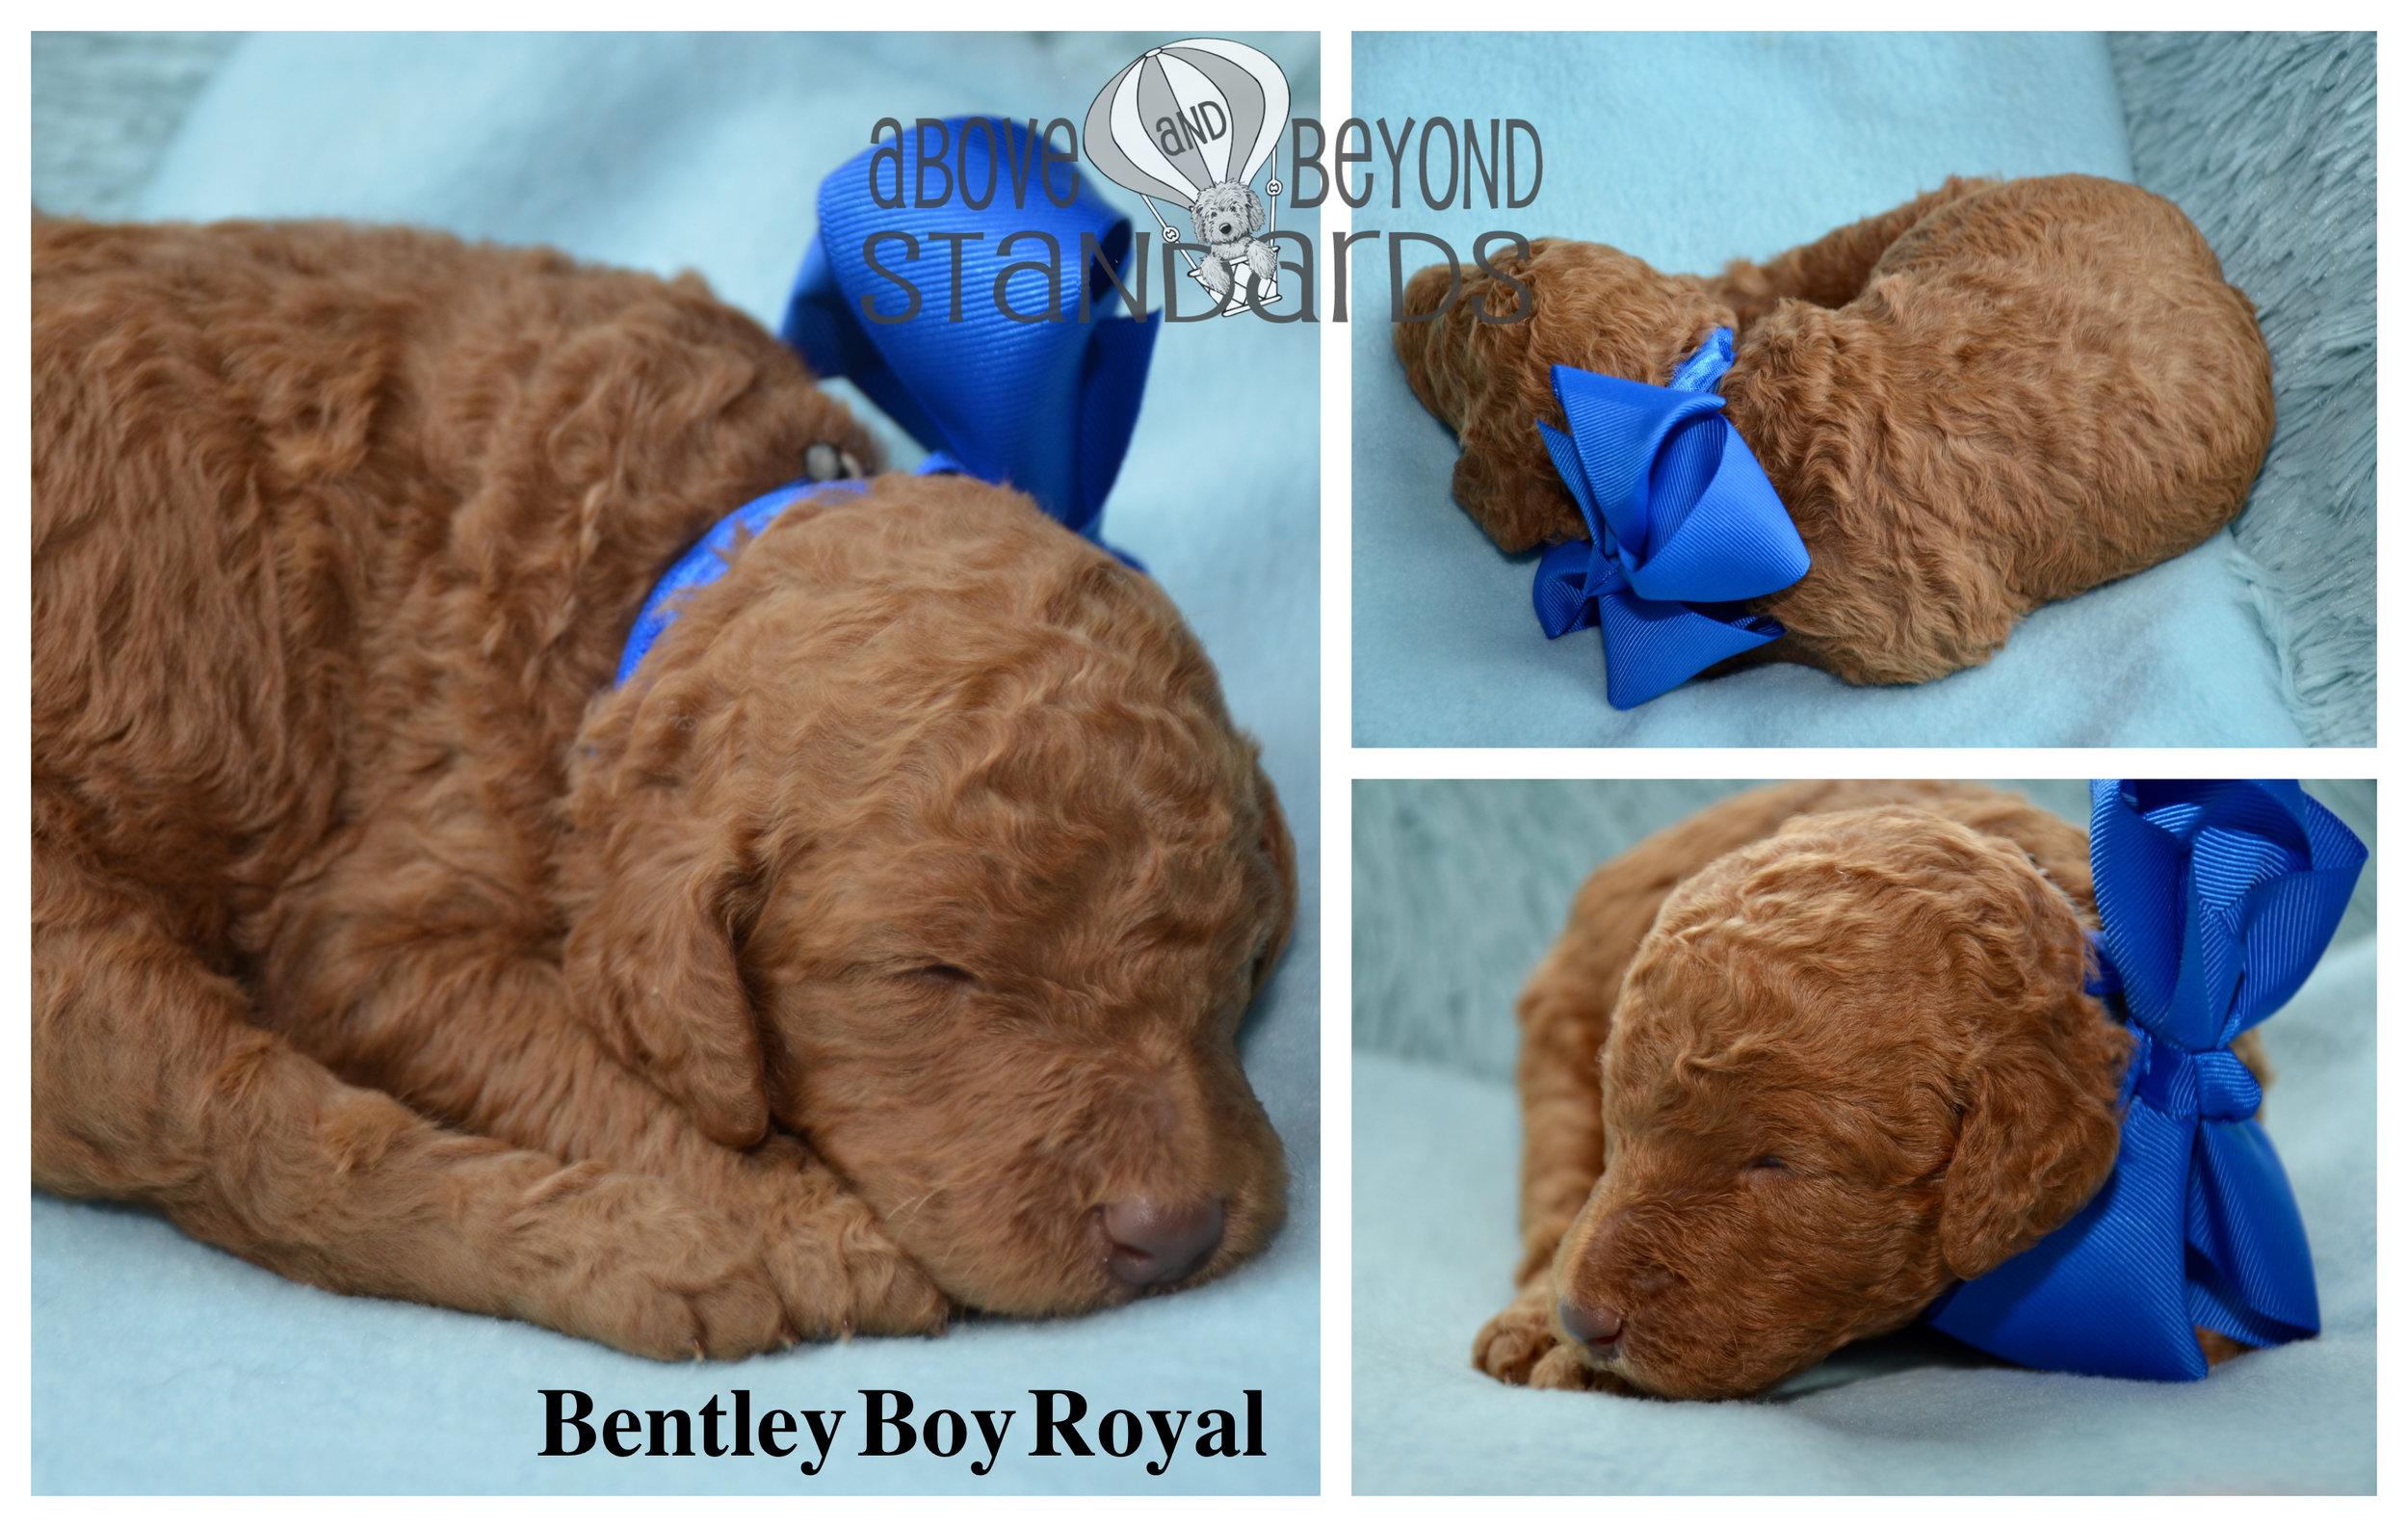 Bentley Boy Royal - EMILIE & CRUSHER STANDARD POODLE FEBRUARY 2ND, 2019.jpg